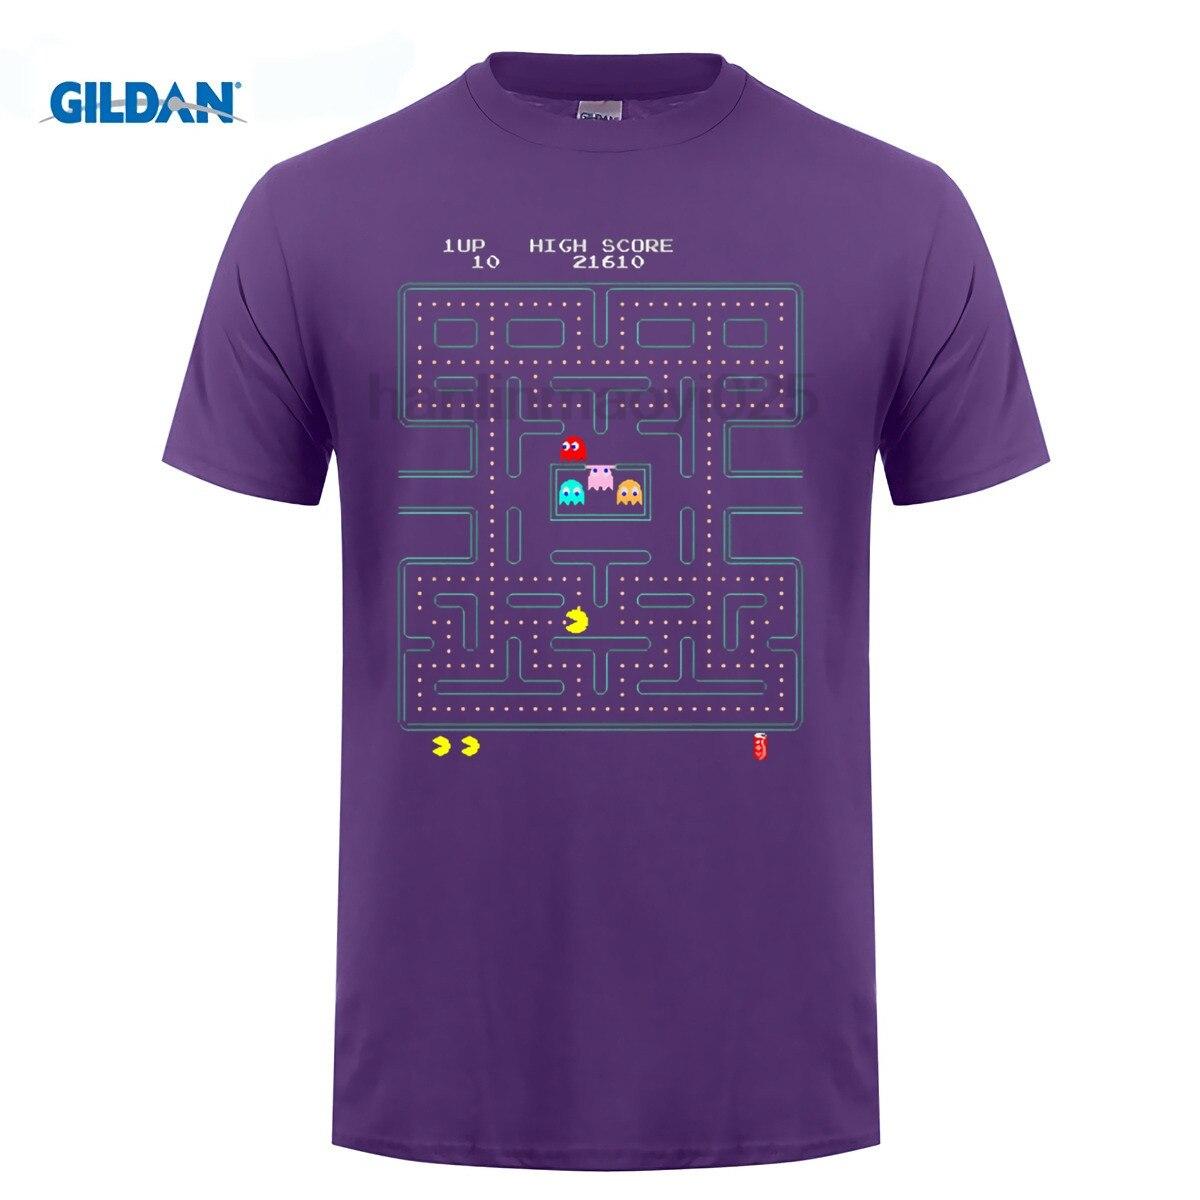 GILDAN Pac man T Shirt (2) Hop No Buckle Men Simple Shop Video game quality effect T-shirt